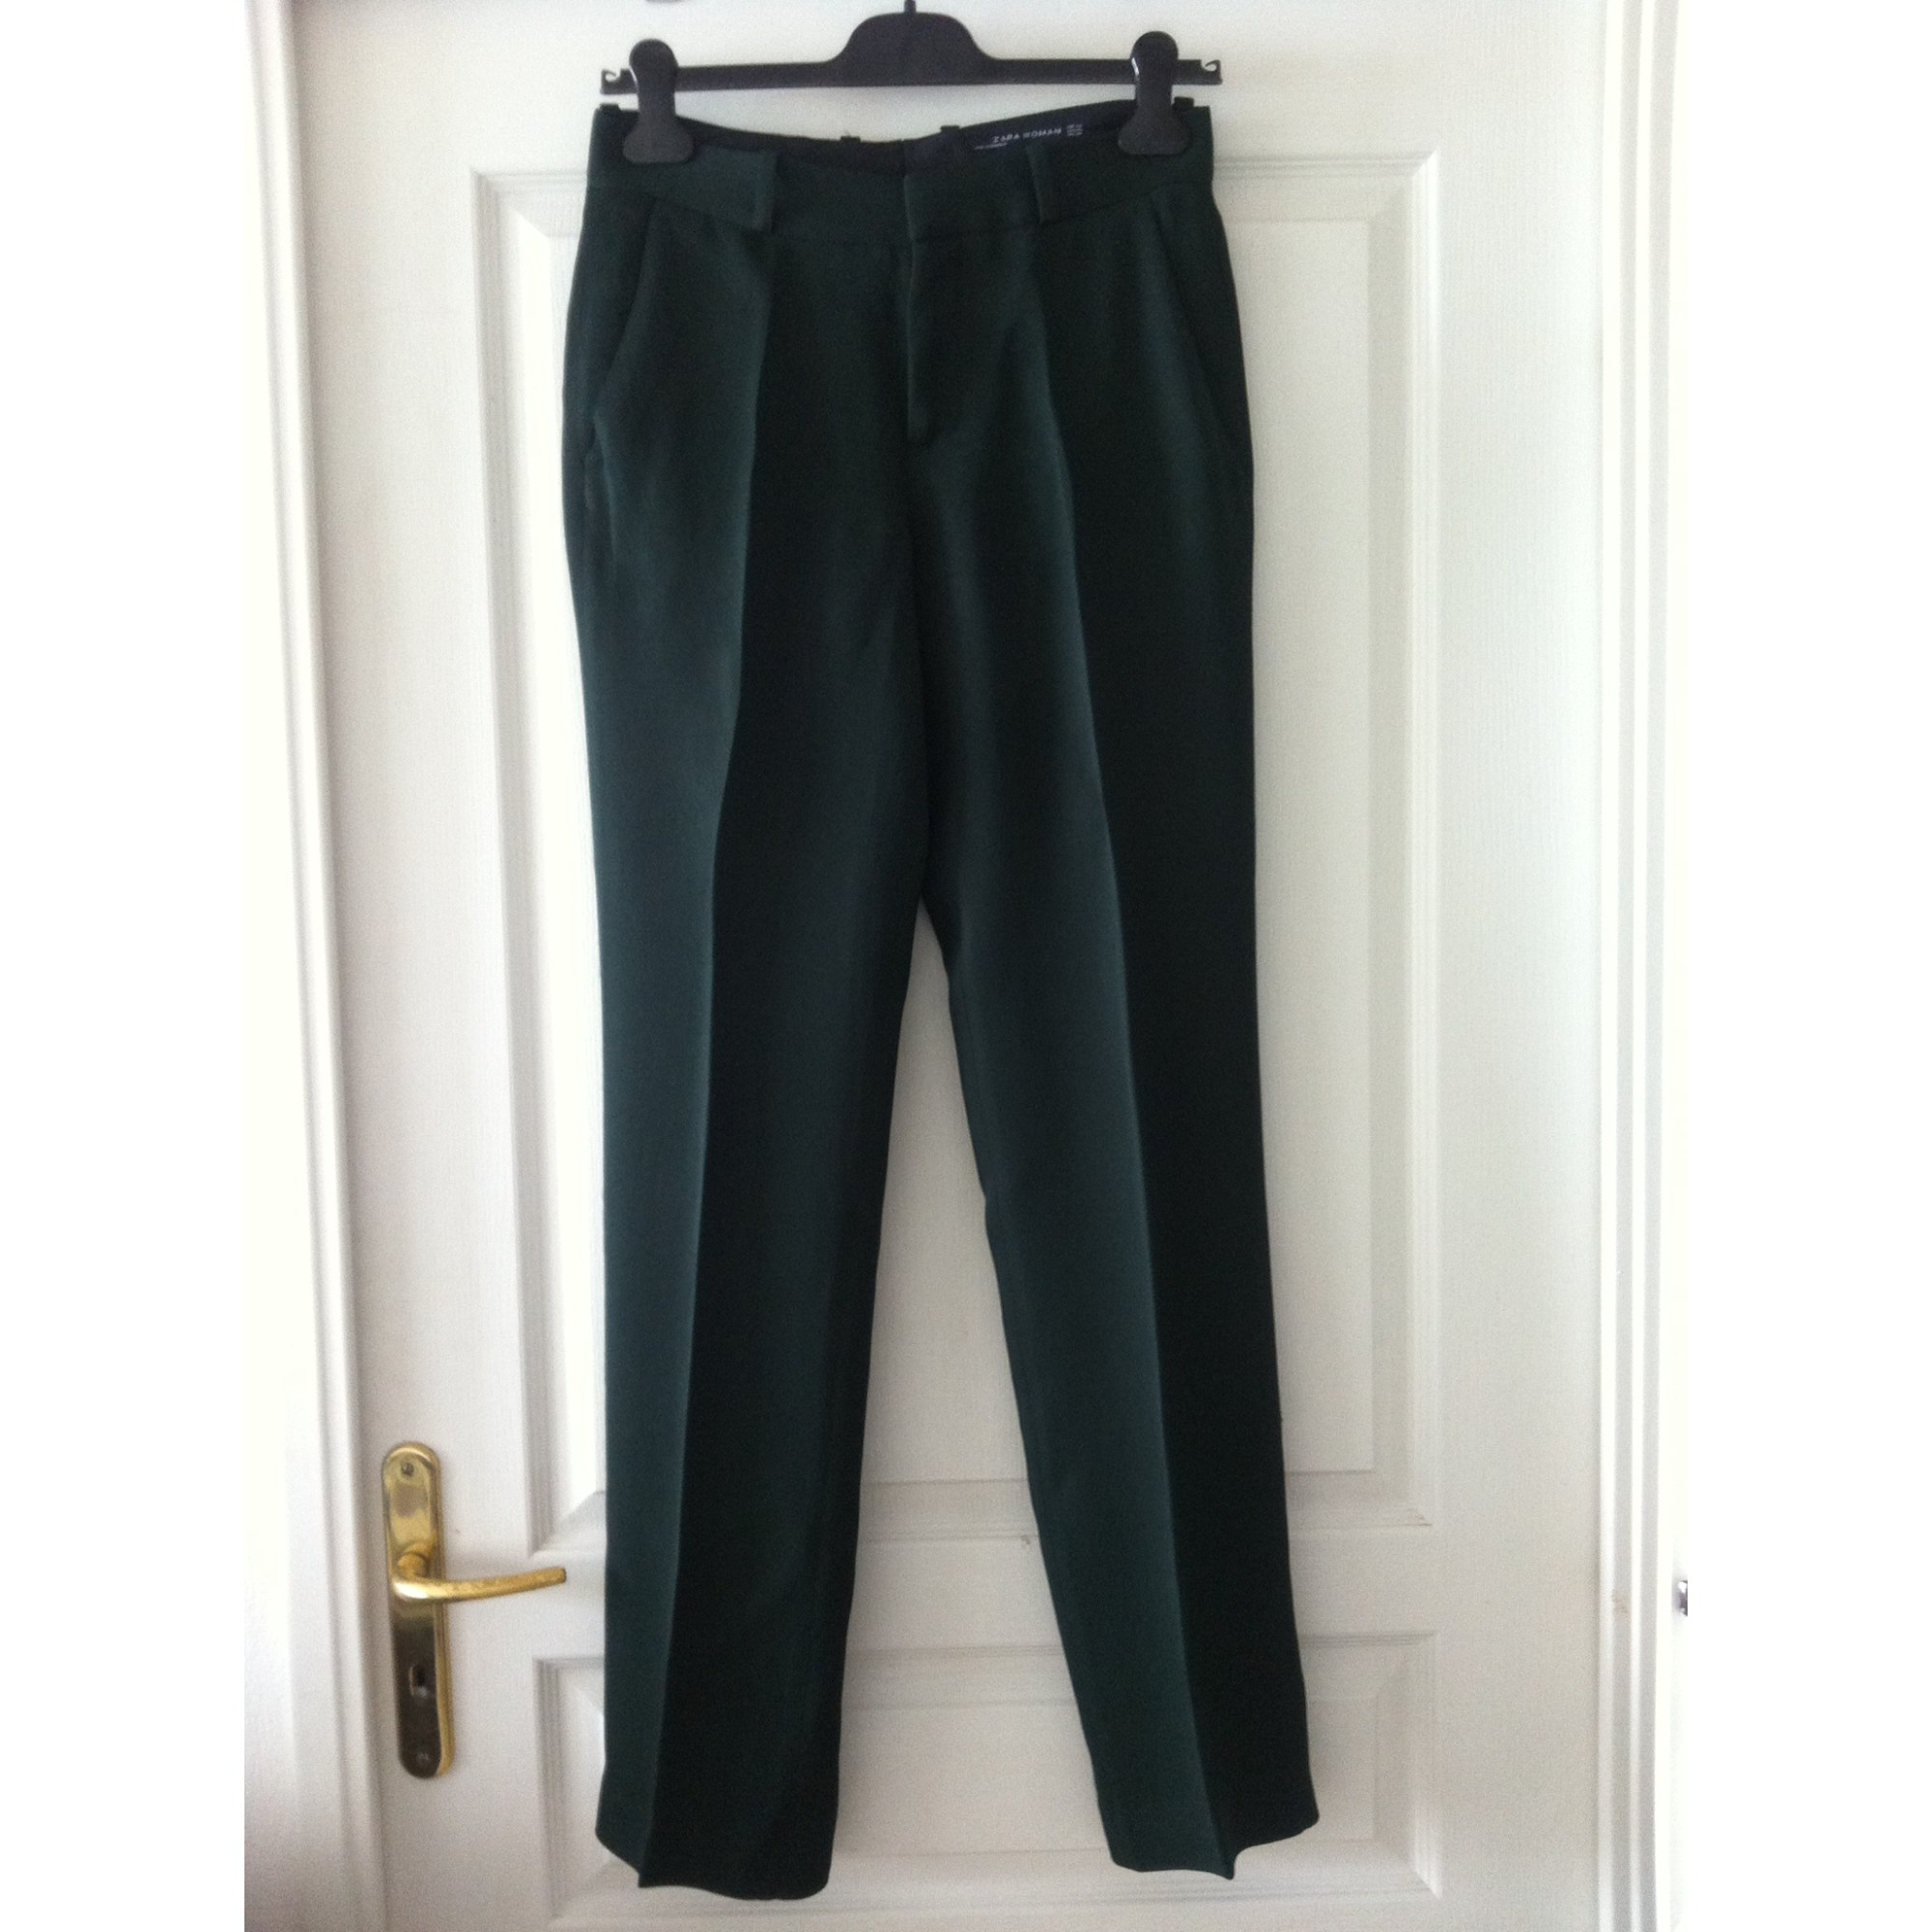 pantalon droit femme zara